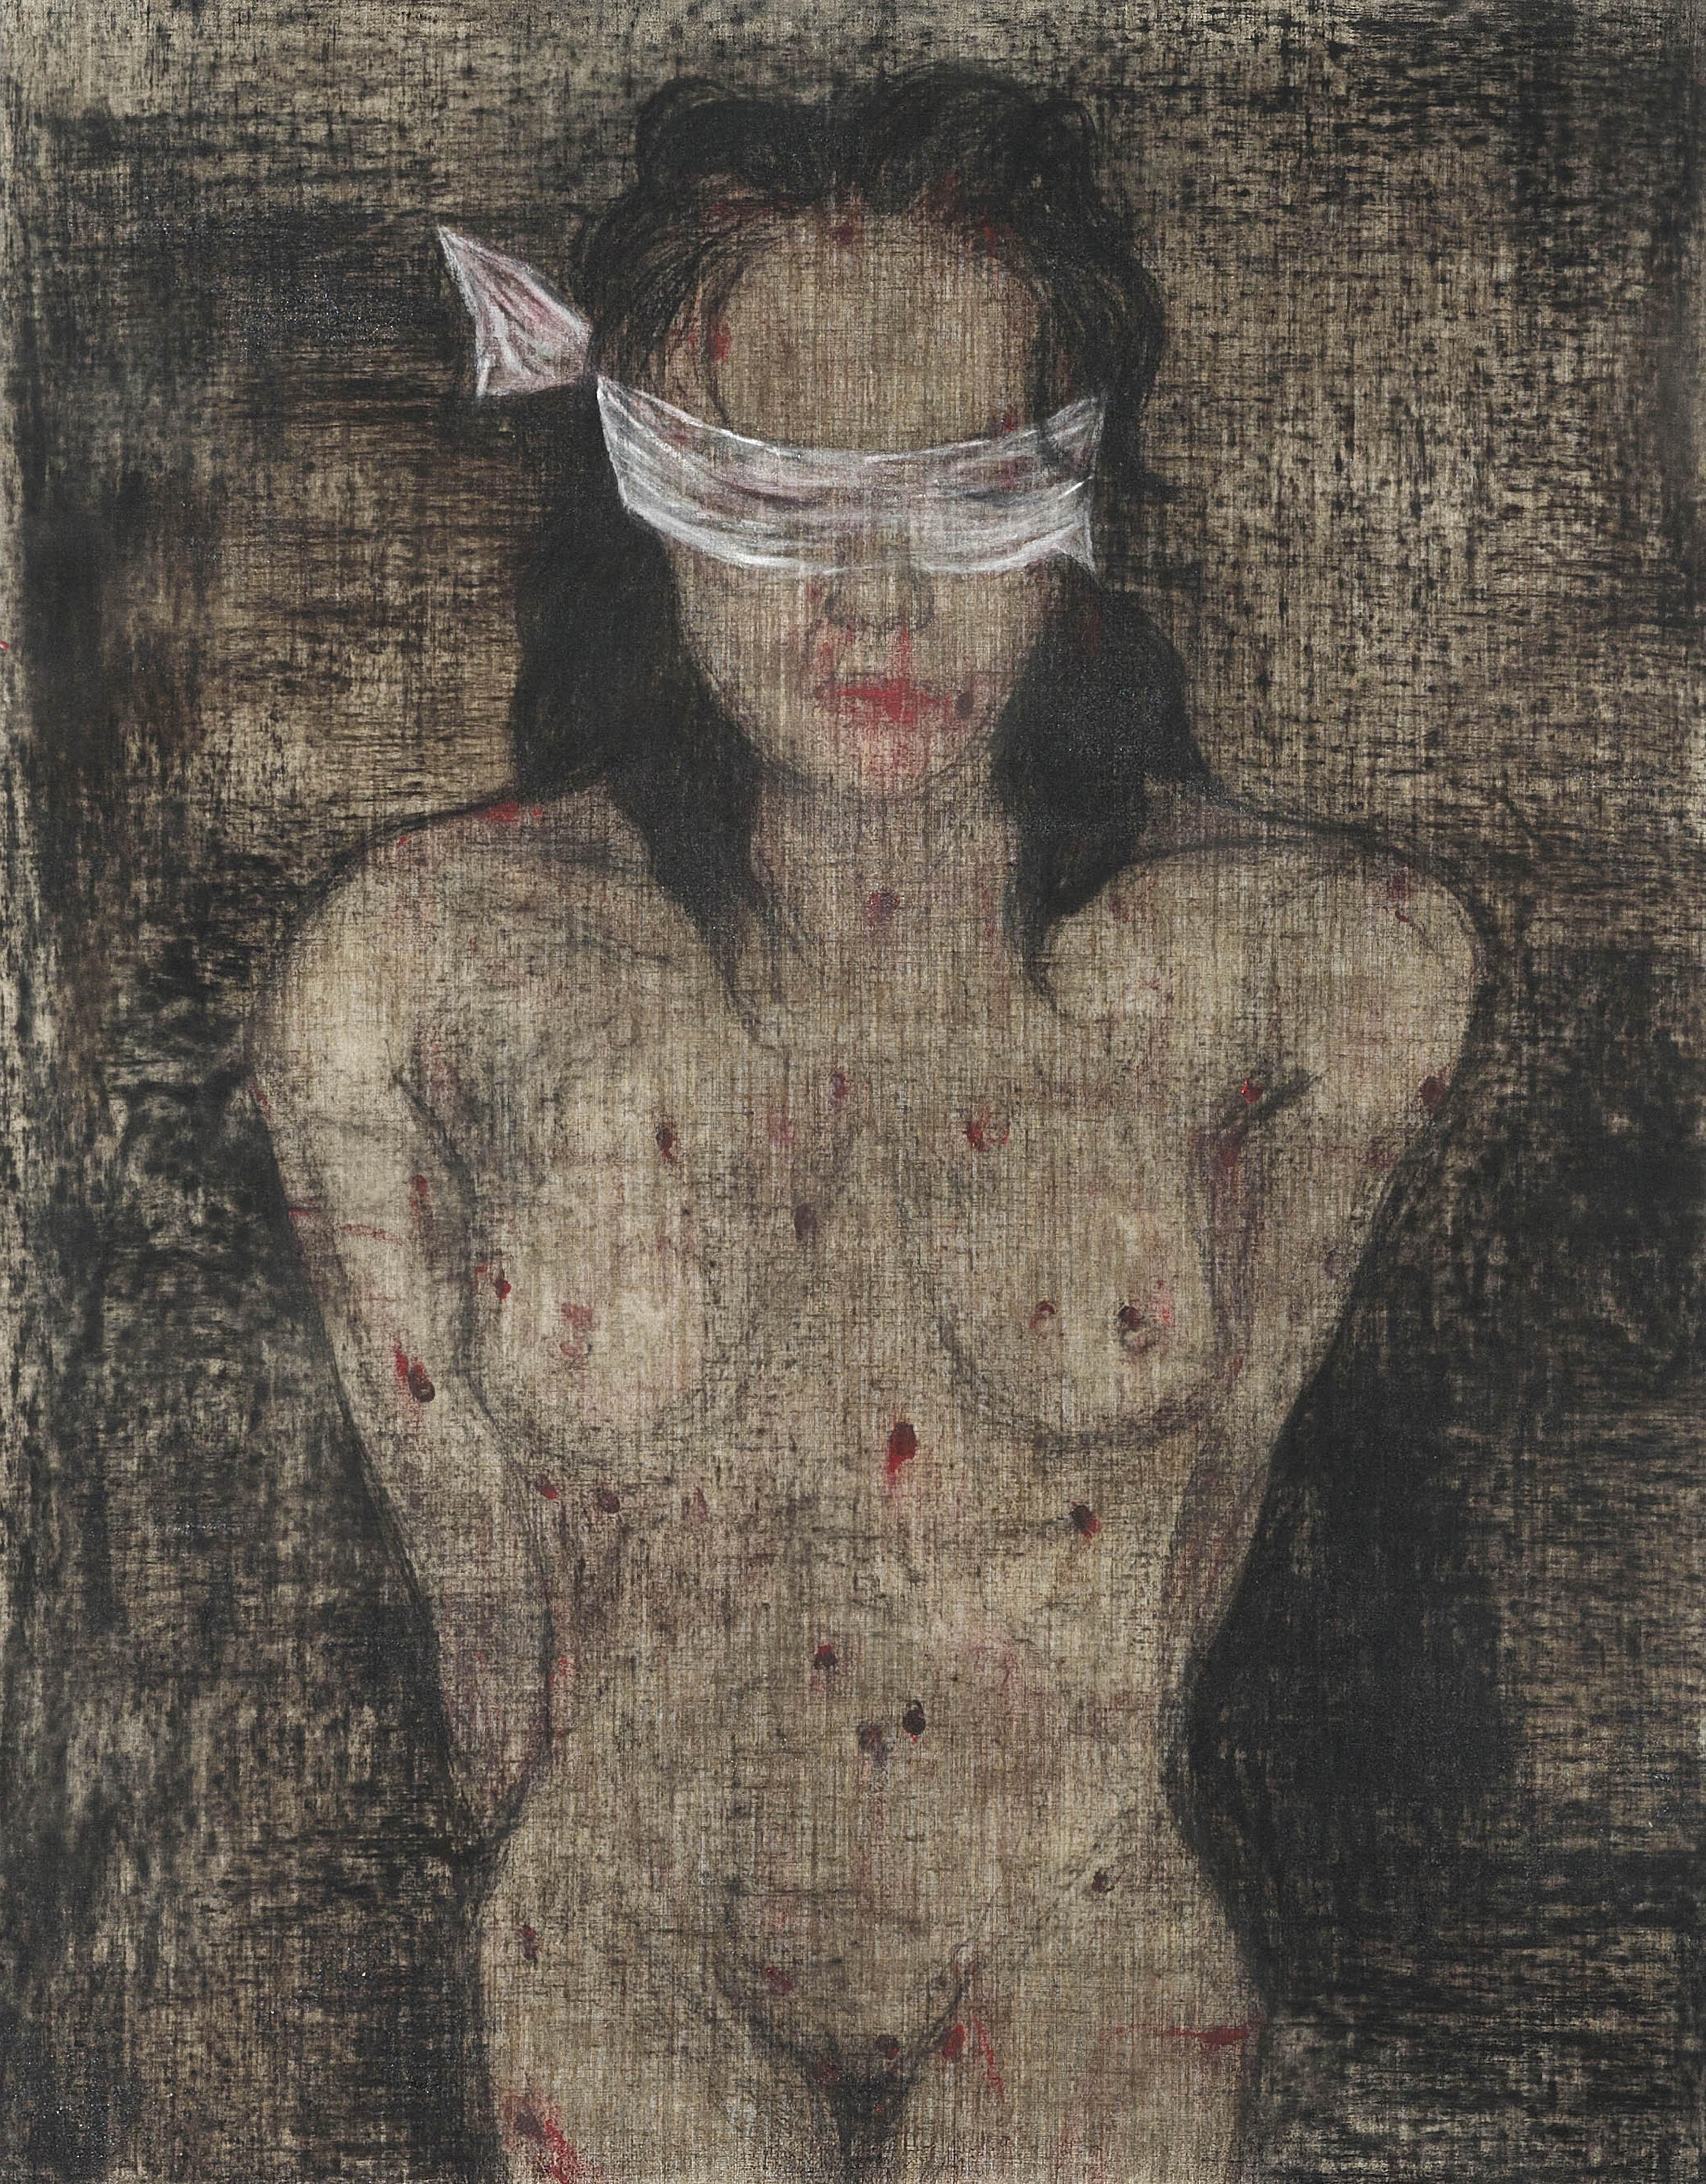 Ciduk, Siksa, Bunuh, Buang II (2018) Acrylic and charcoal on canvas; 162cm x 127cm